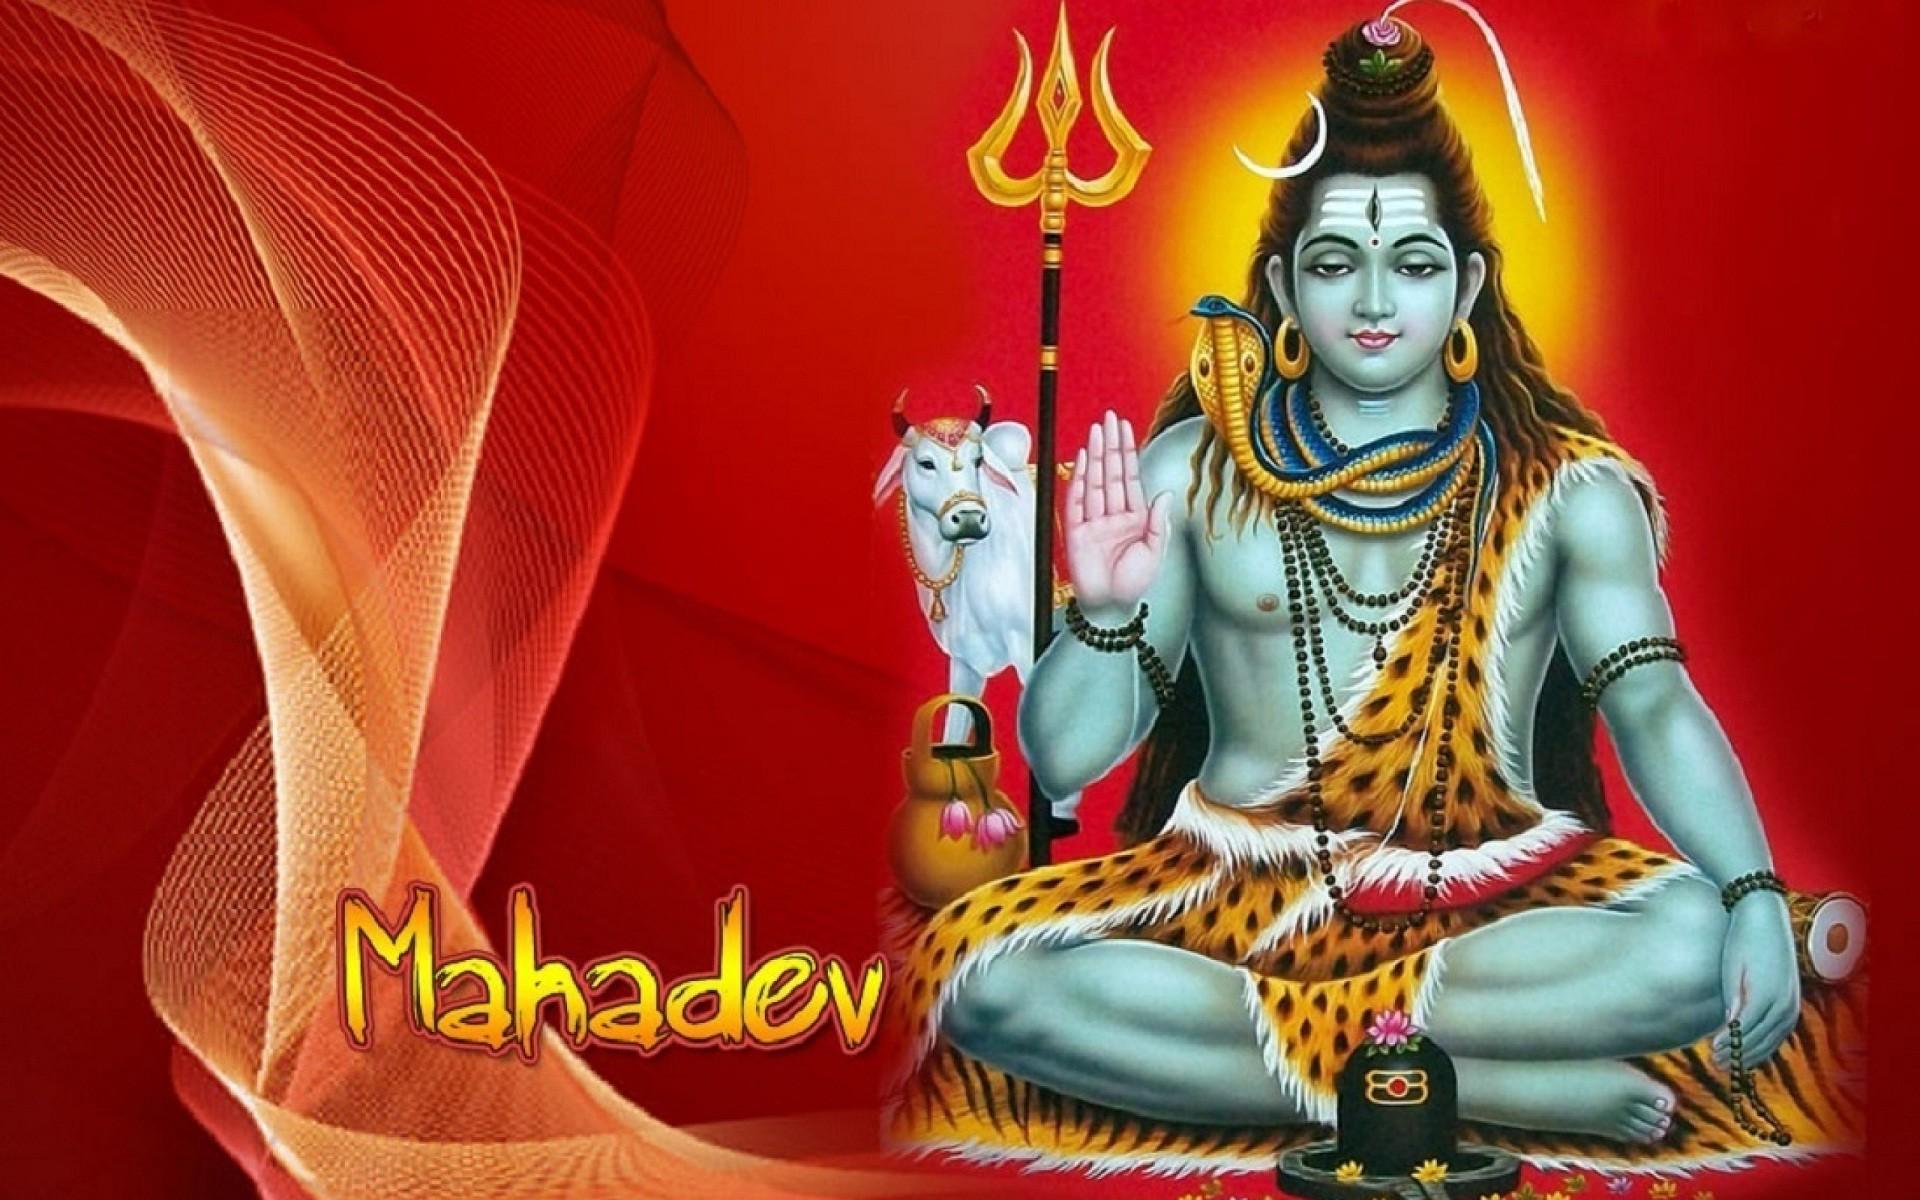 Lord shiva mahadev high quality wide wallpapers